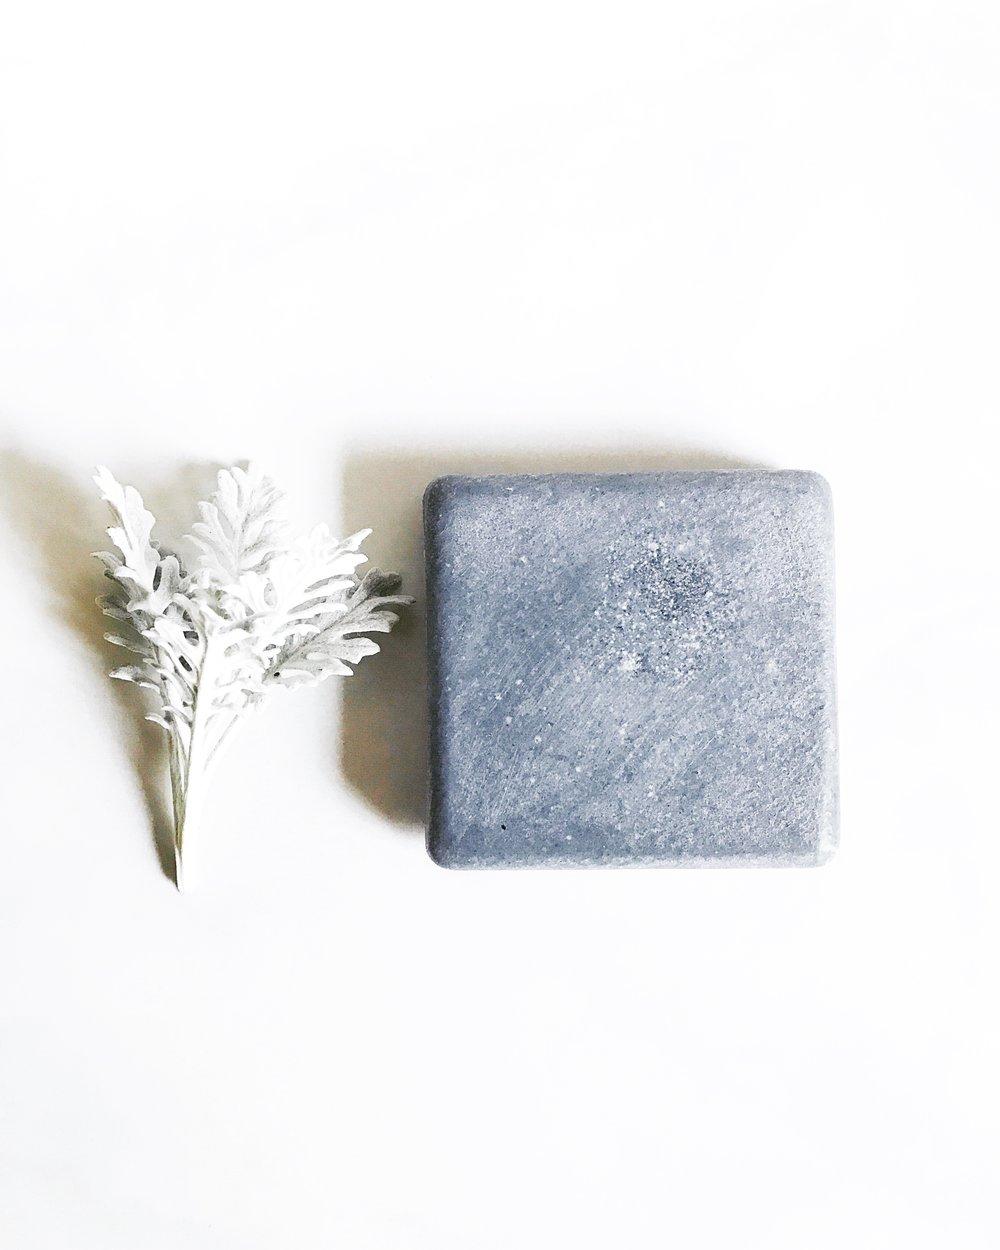 Charcoal + Kaolin Clay Bar | $8 |